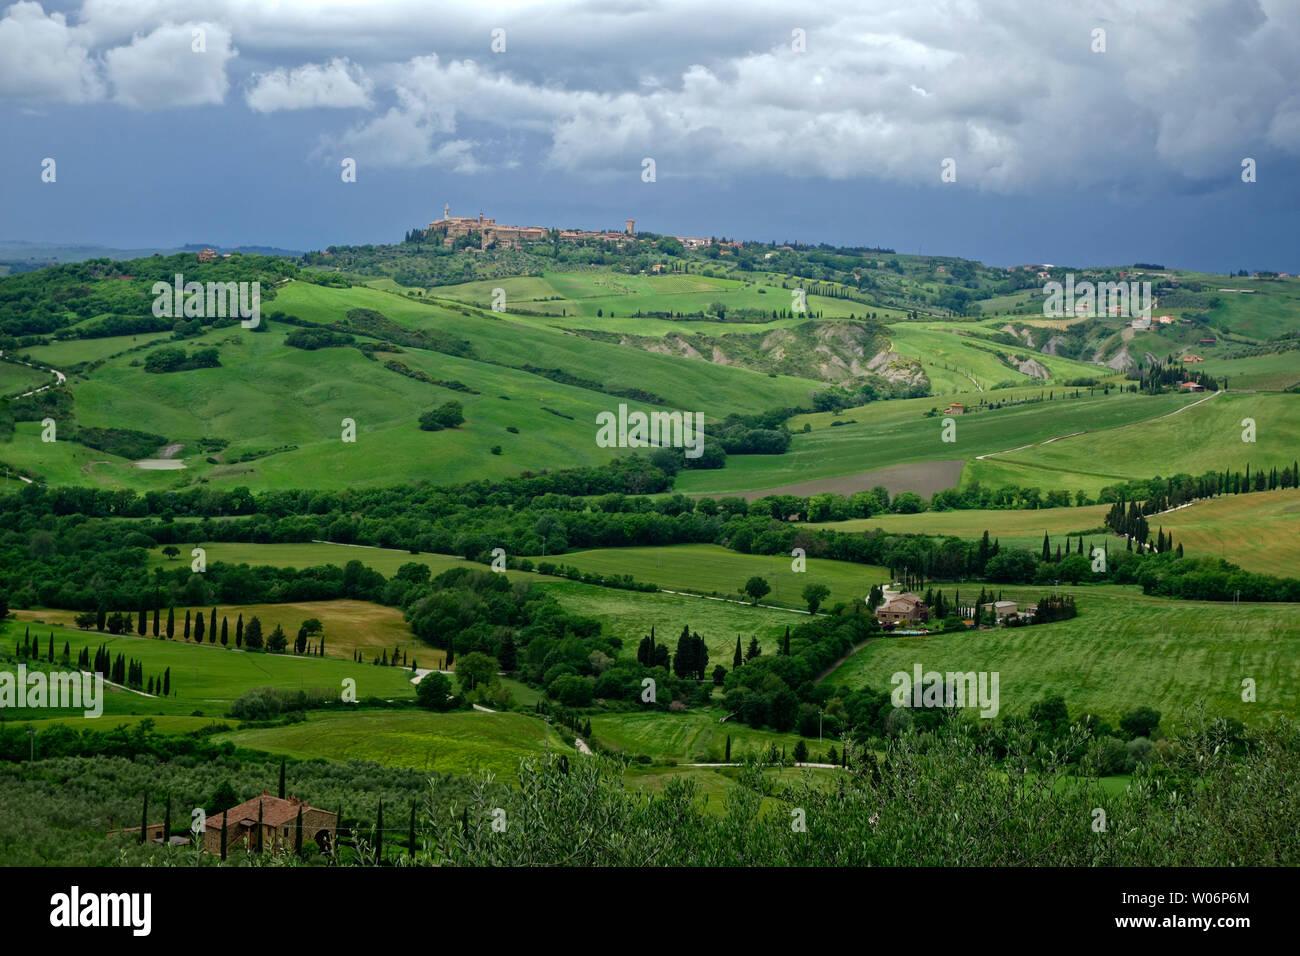 AROUND PIENZA . TUSCANY . ITALY - Stock Image